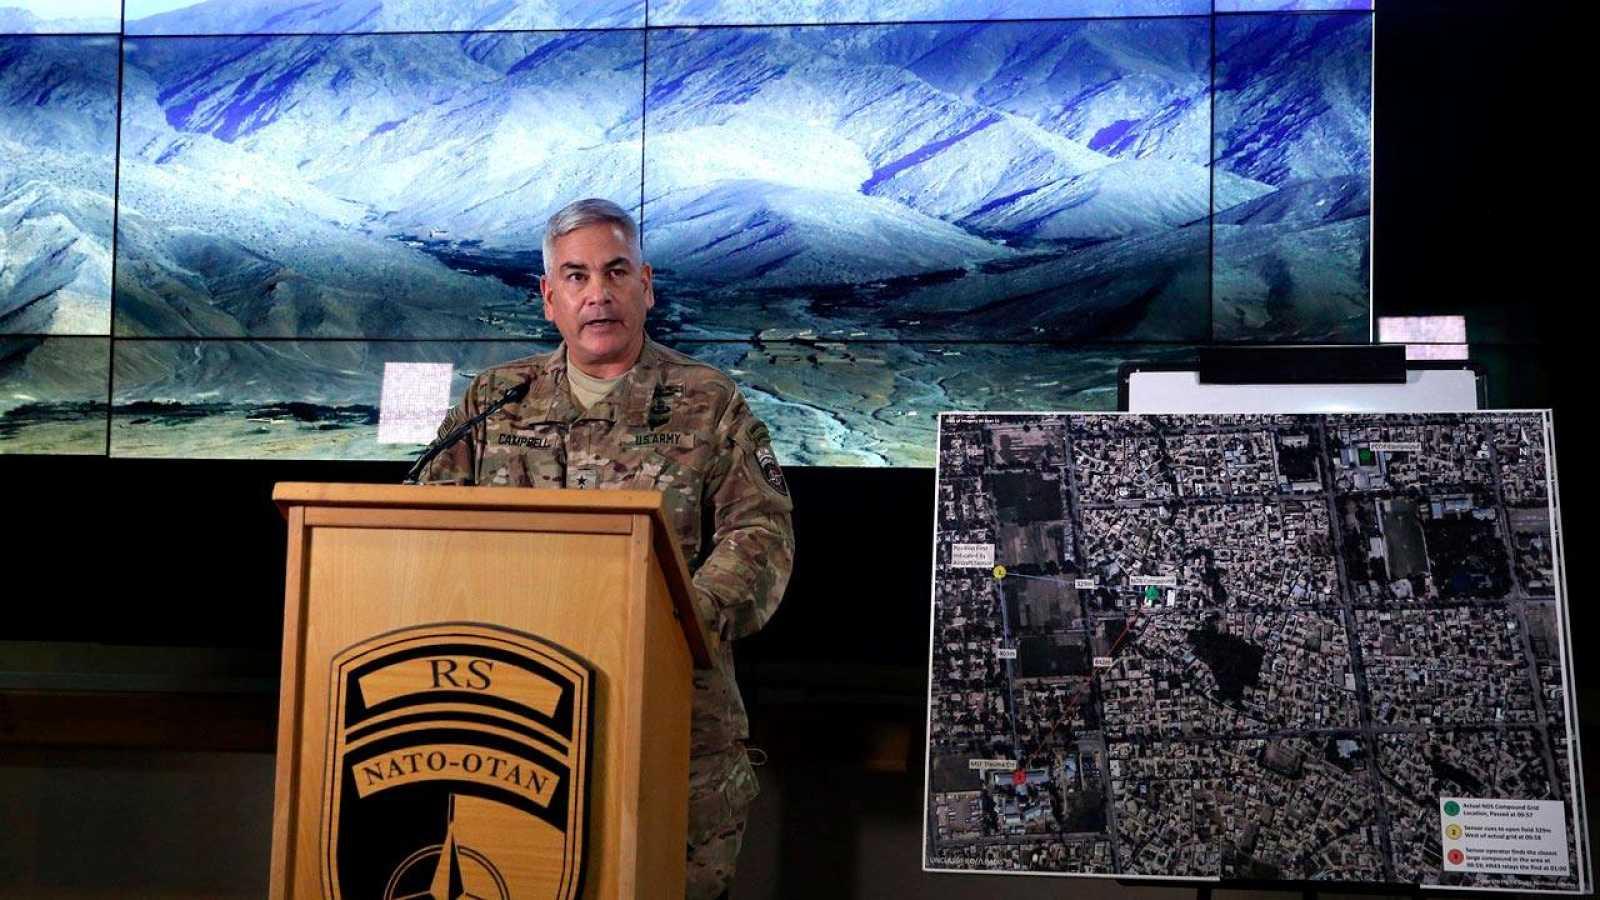 El comandante John Campbell, máximo responsable militar de EE.UU. en Afganistán